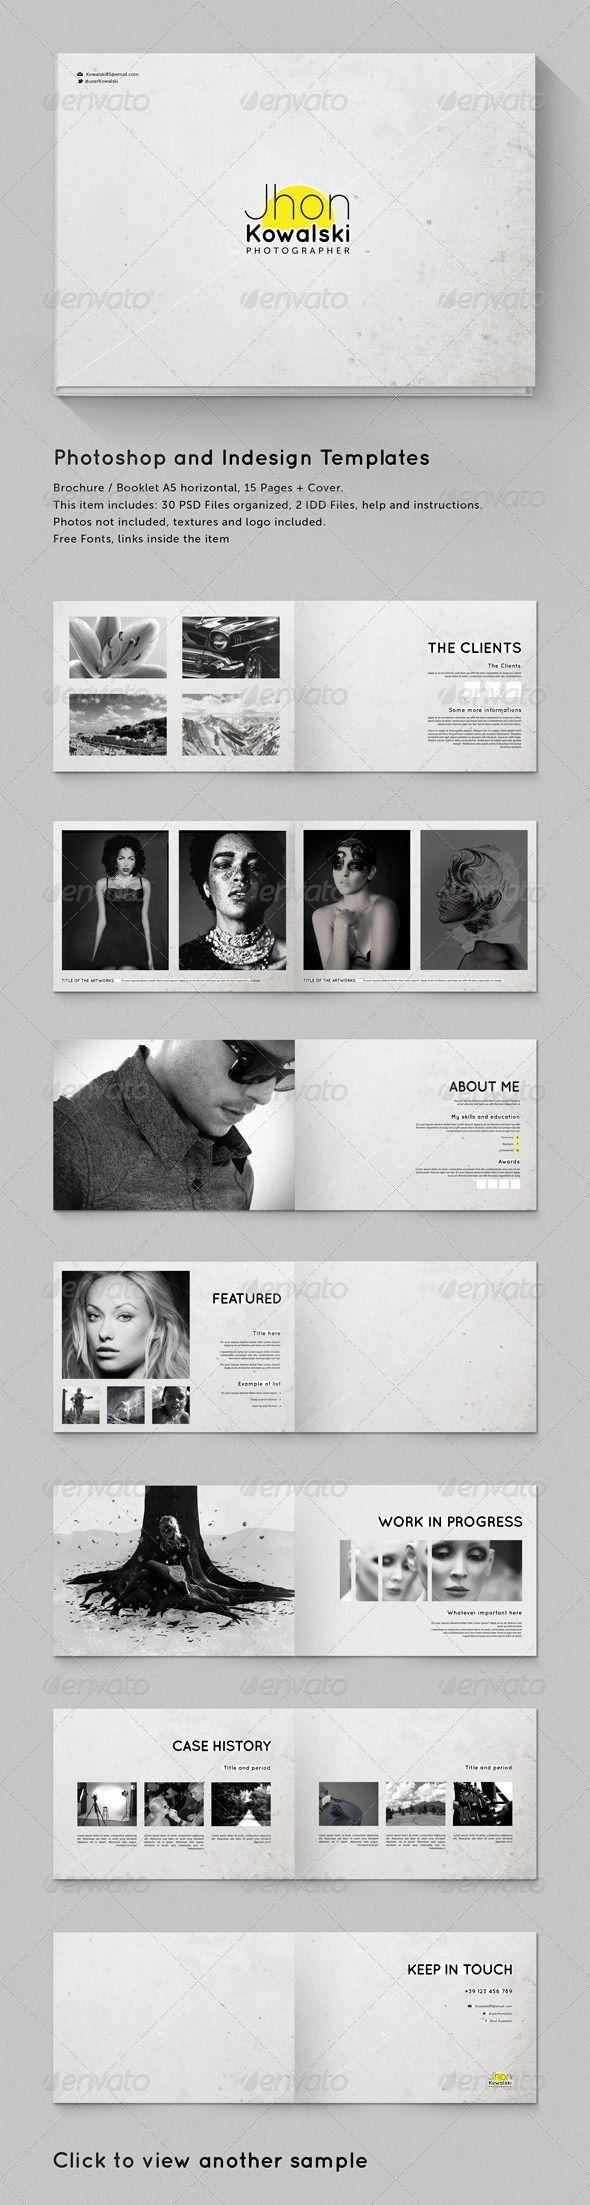 A5 Brochure - Booklet Template Minimal Portfolio   Booklet template ...